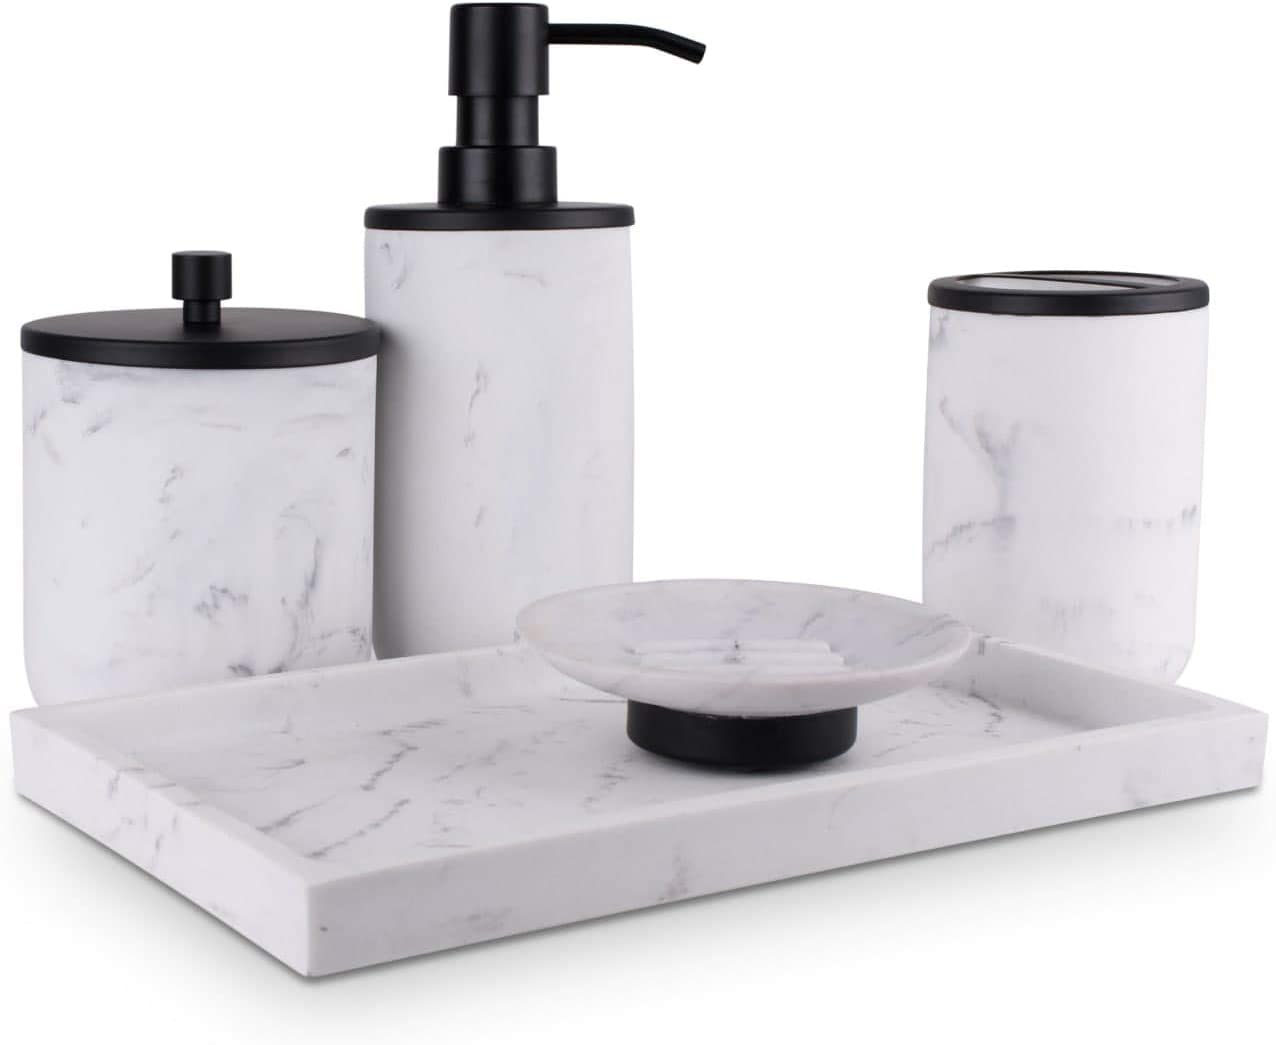 L'MKI Bathroom Soap Dispenser Set - Bathroom Toothbrush Holder Set, Marble Bathroom Accessories, Matte Black Bathroom Accessories Set, Farmhouse Bathroom Decor, 5-Piece Bathroom Accessories Set